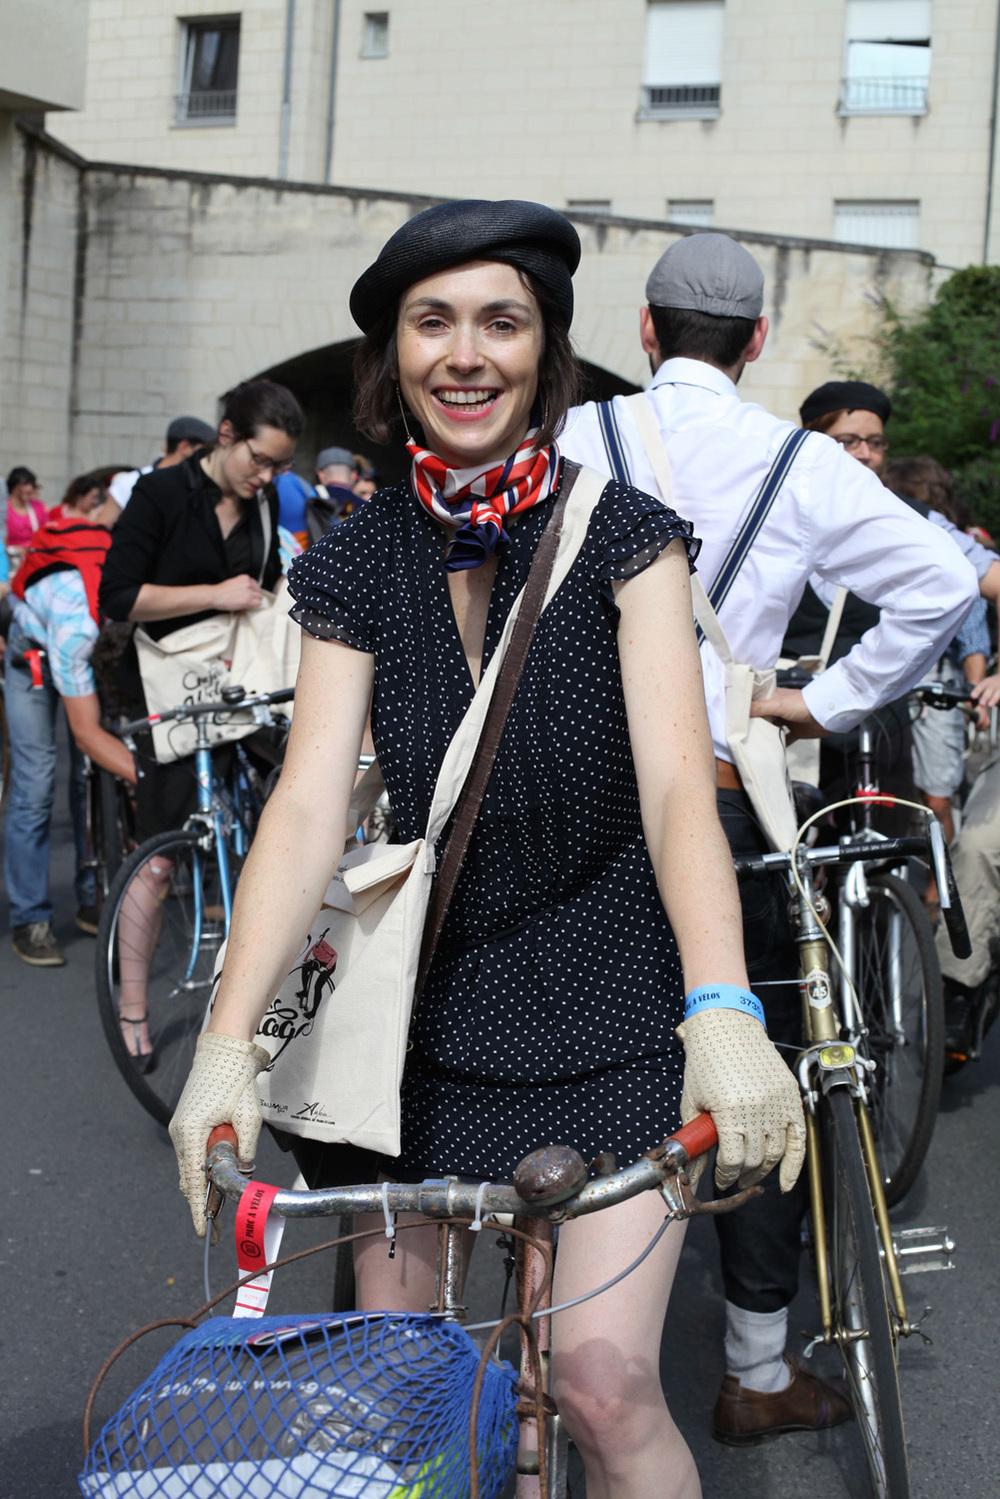 Goodbye-Anjou-Velo-Vintage-Bike-Pretty-Bike-Fashion-2.jpg